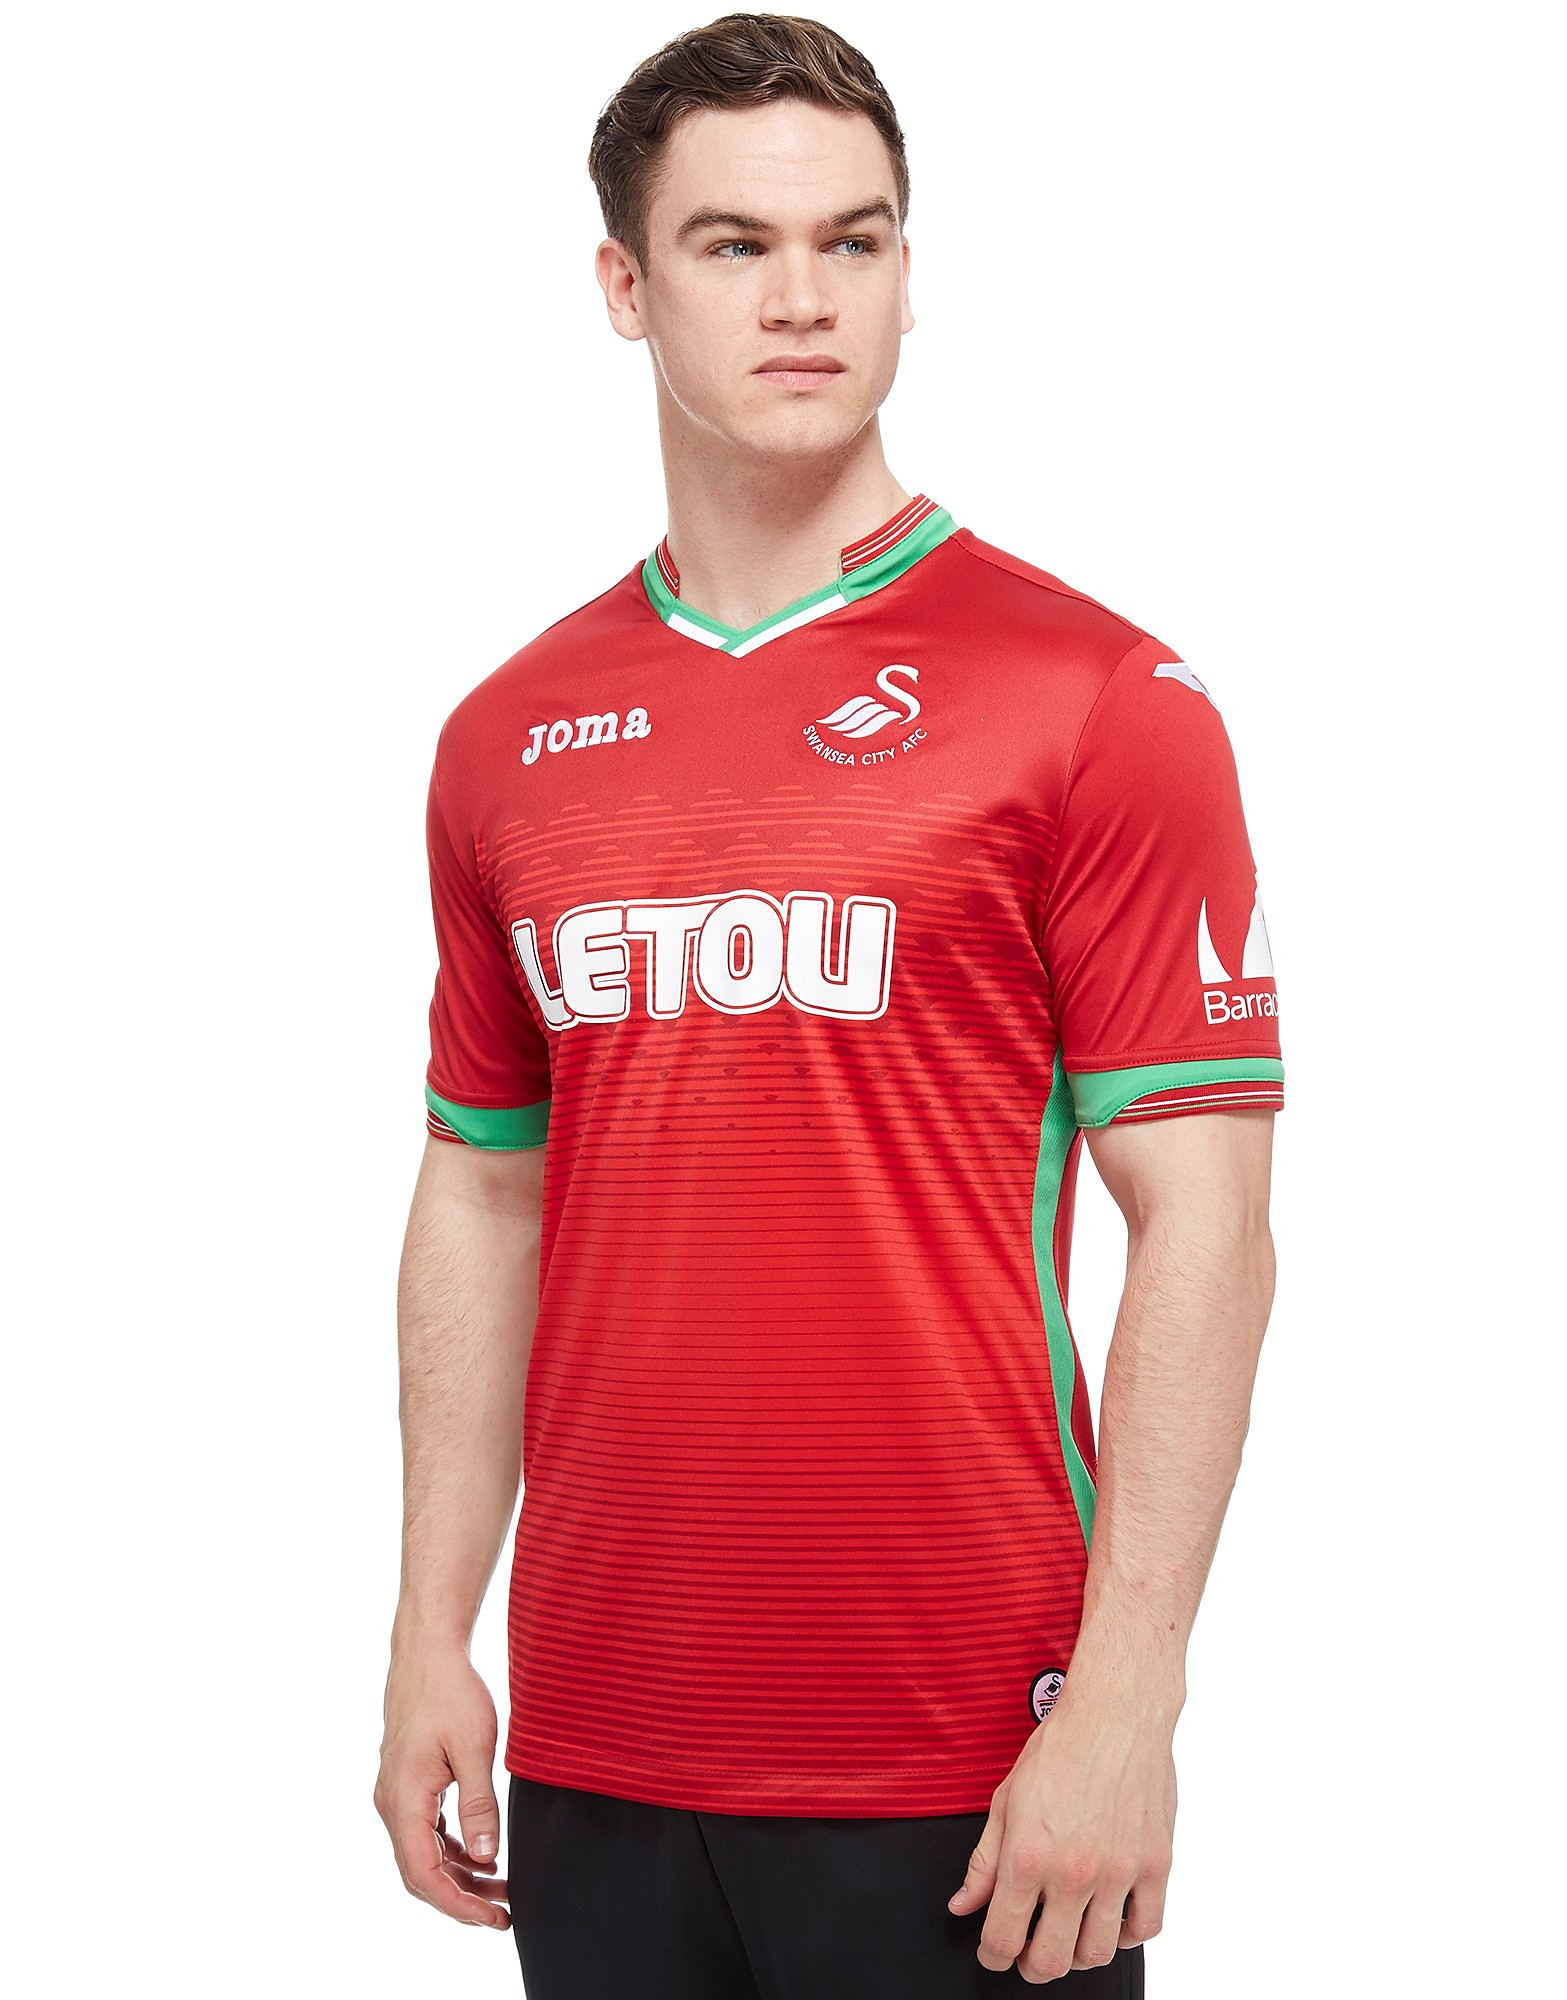 Joma Swansea City FC 2017/18 Away Shirt